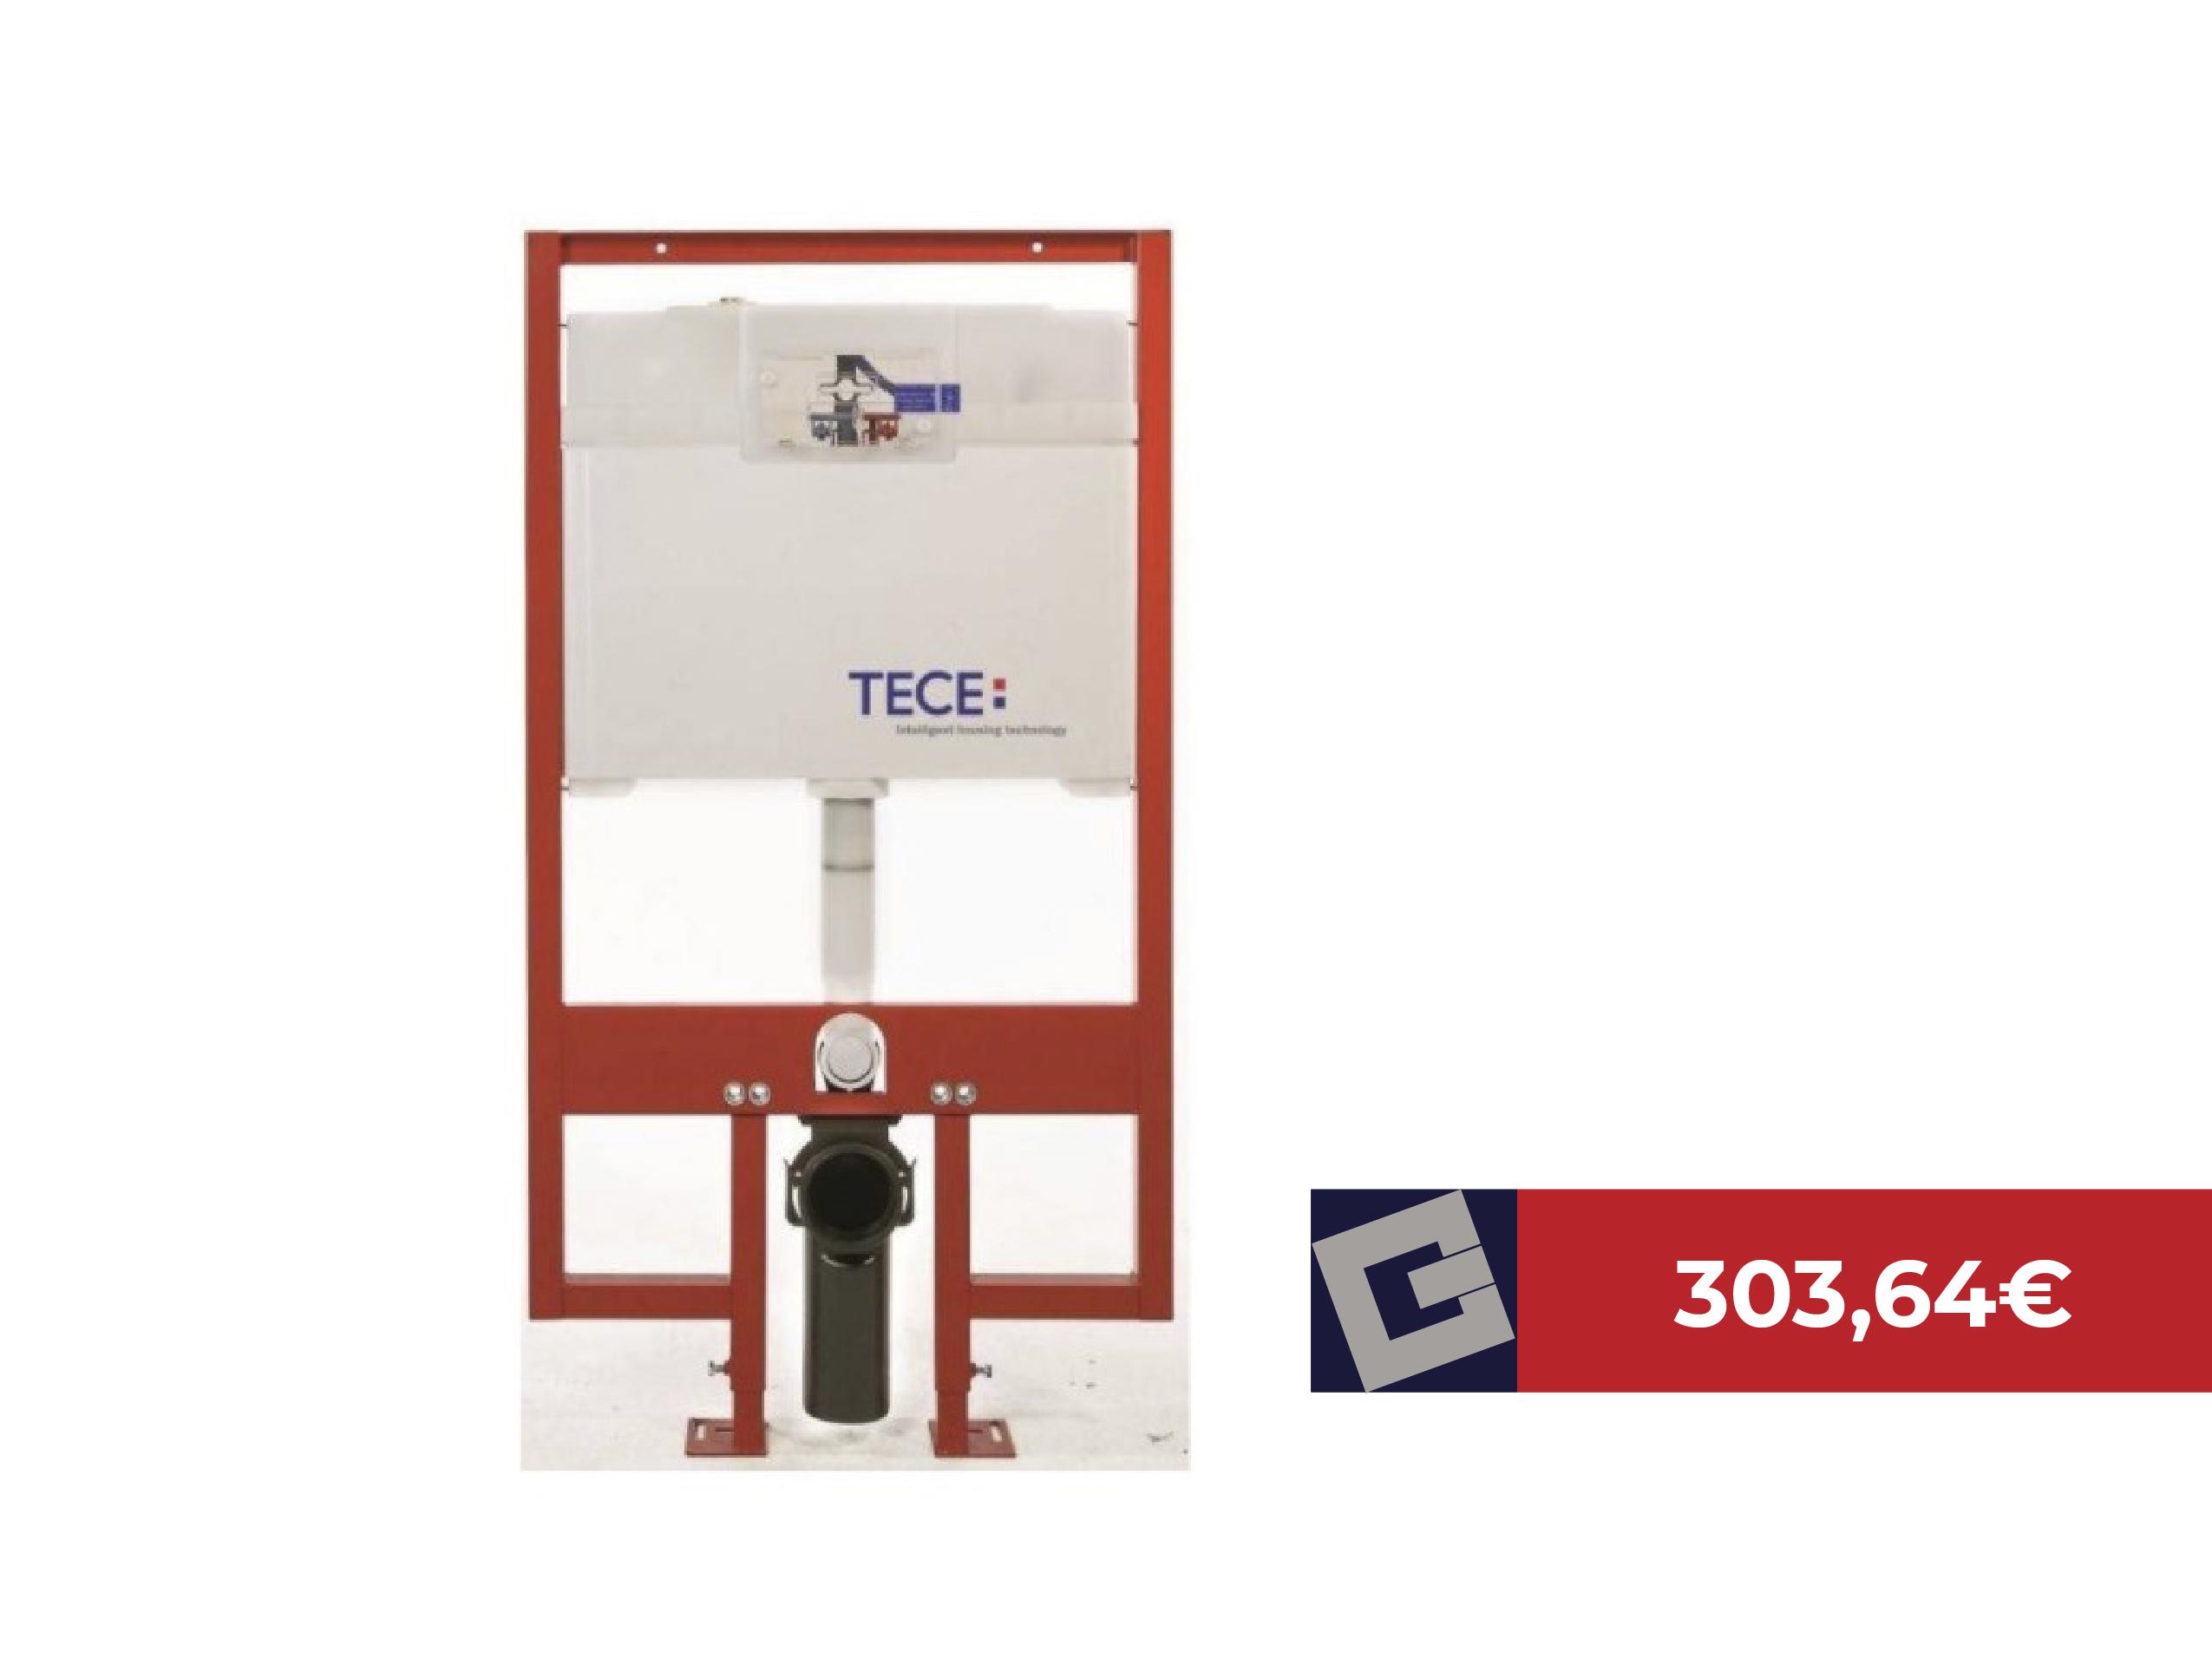 Módulo de inodoro suspendido TECEProfil 9300040 de 8cm